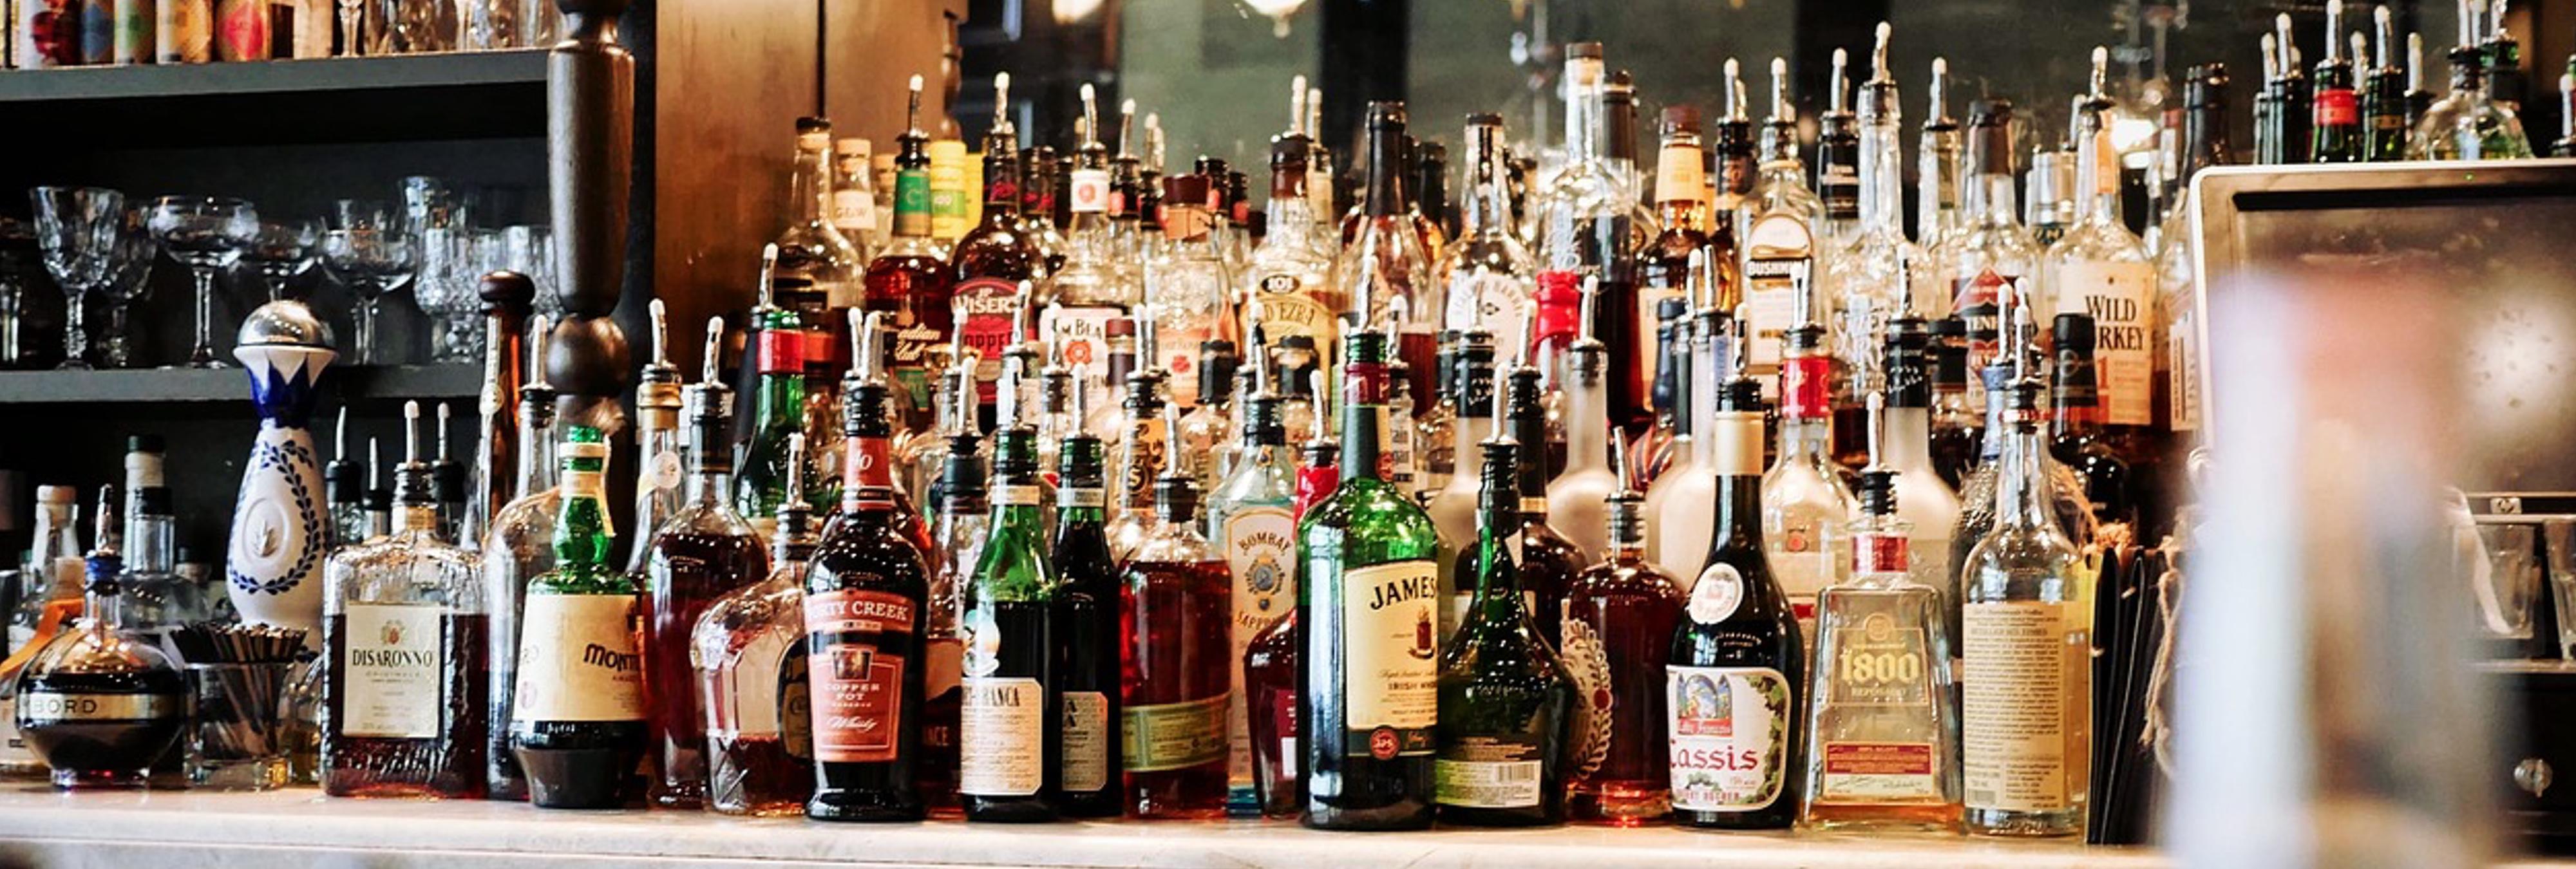 Es posible emborracharse sin beber alcohol